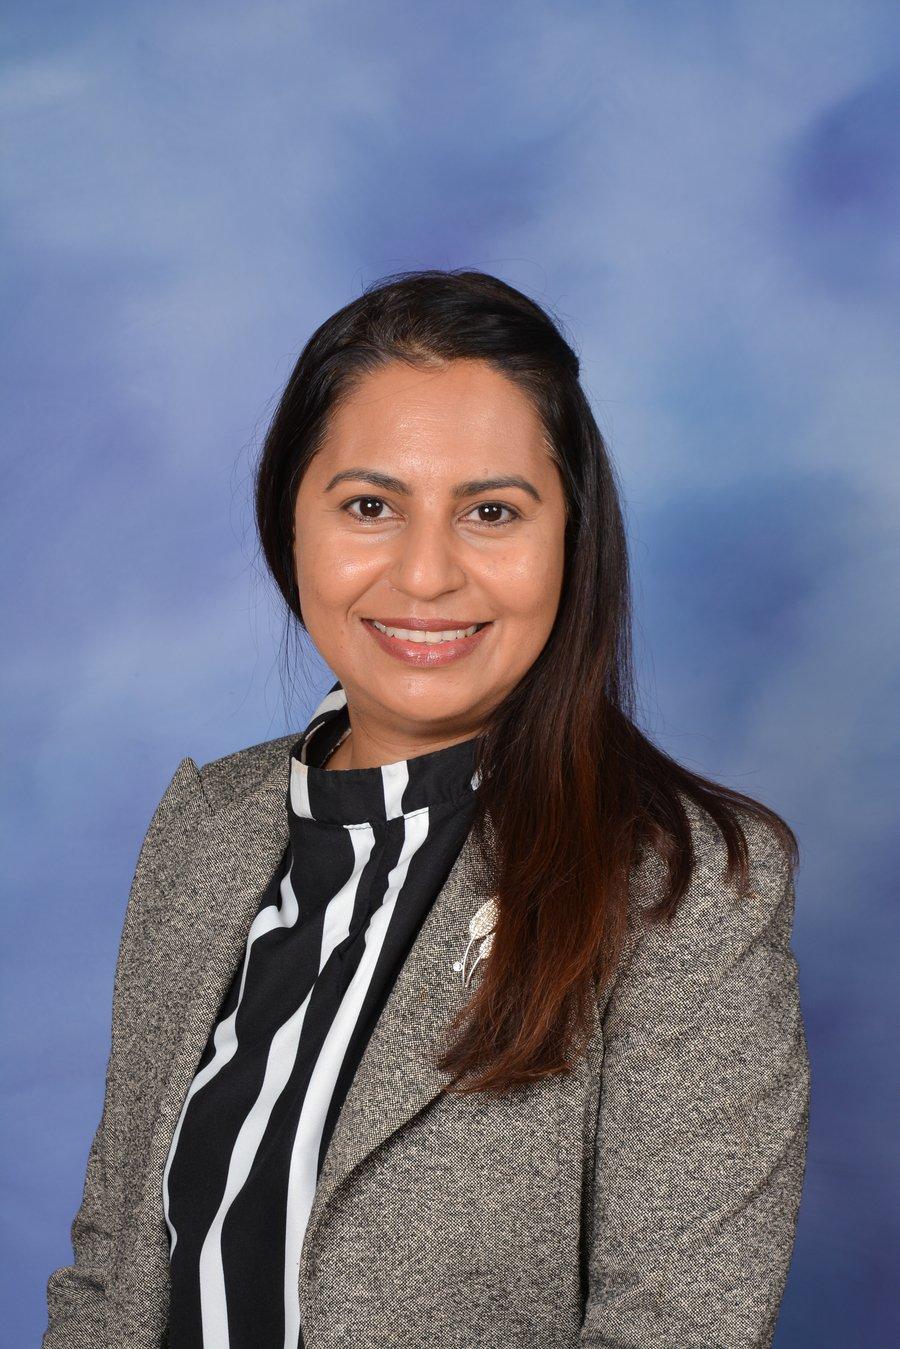 Deputy Designated Safeguarding Lead - Mrs J Bana, Headteacher